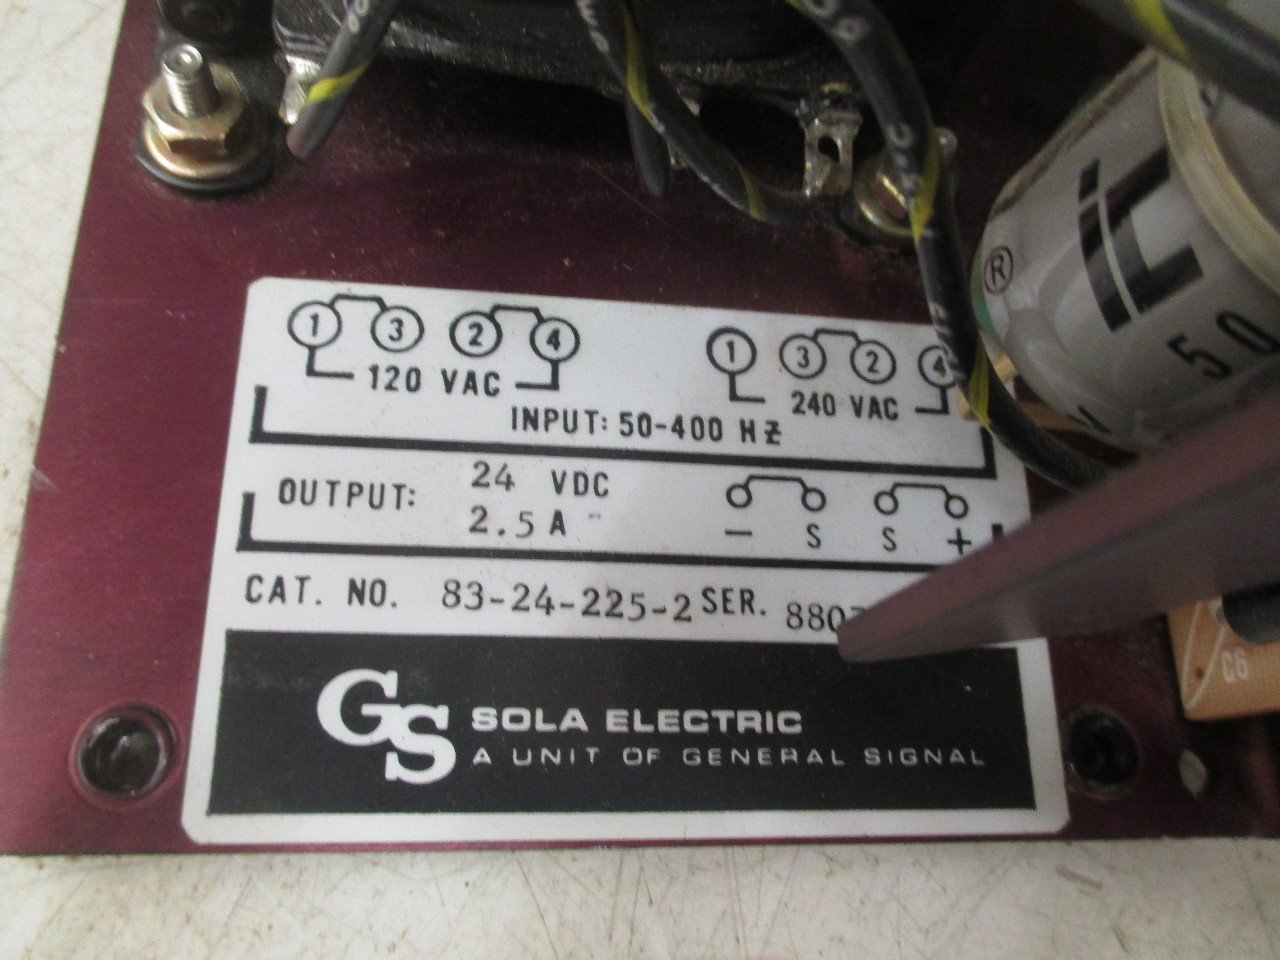 SOLA ELECTRIC POWER SUPPLY 2 5AMP 50-400HZ 24VDC